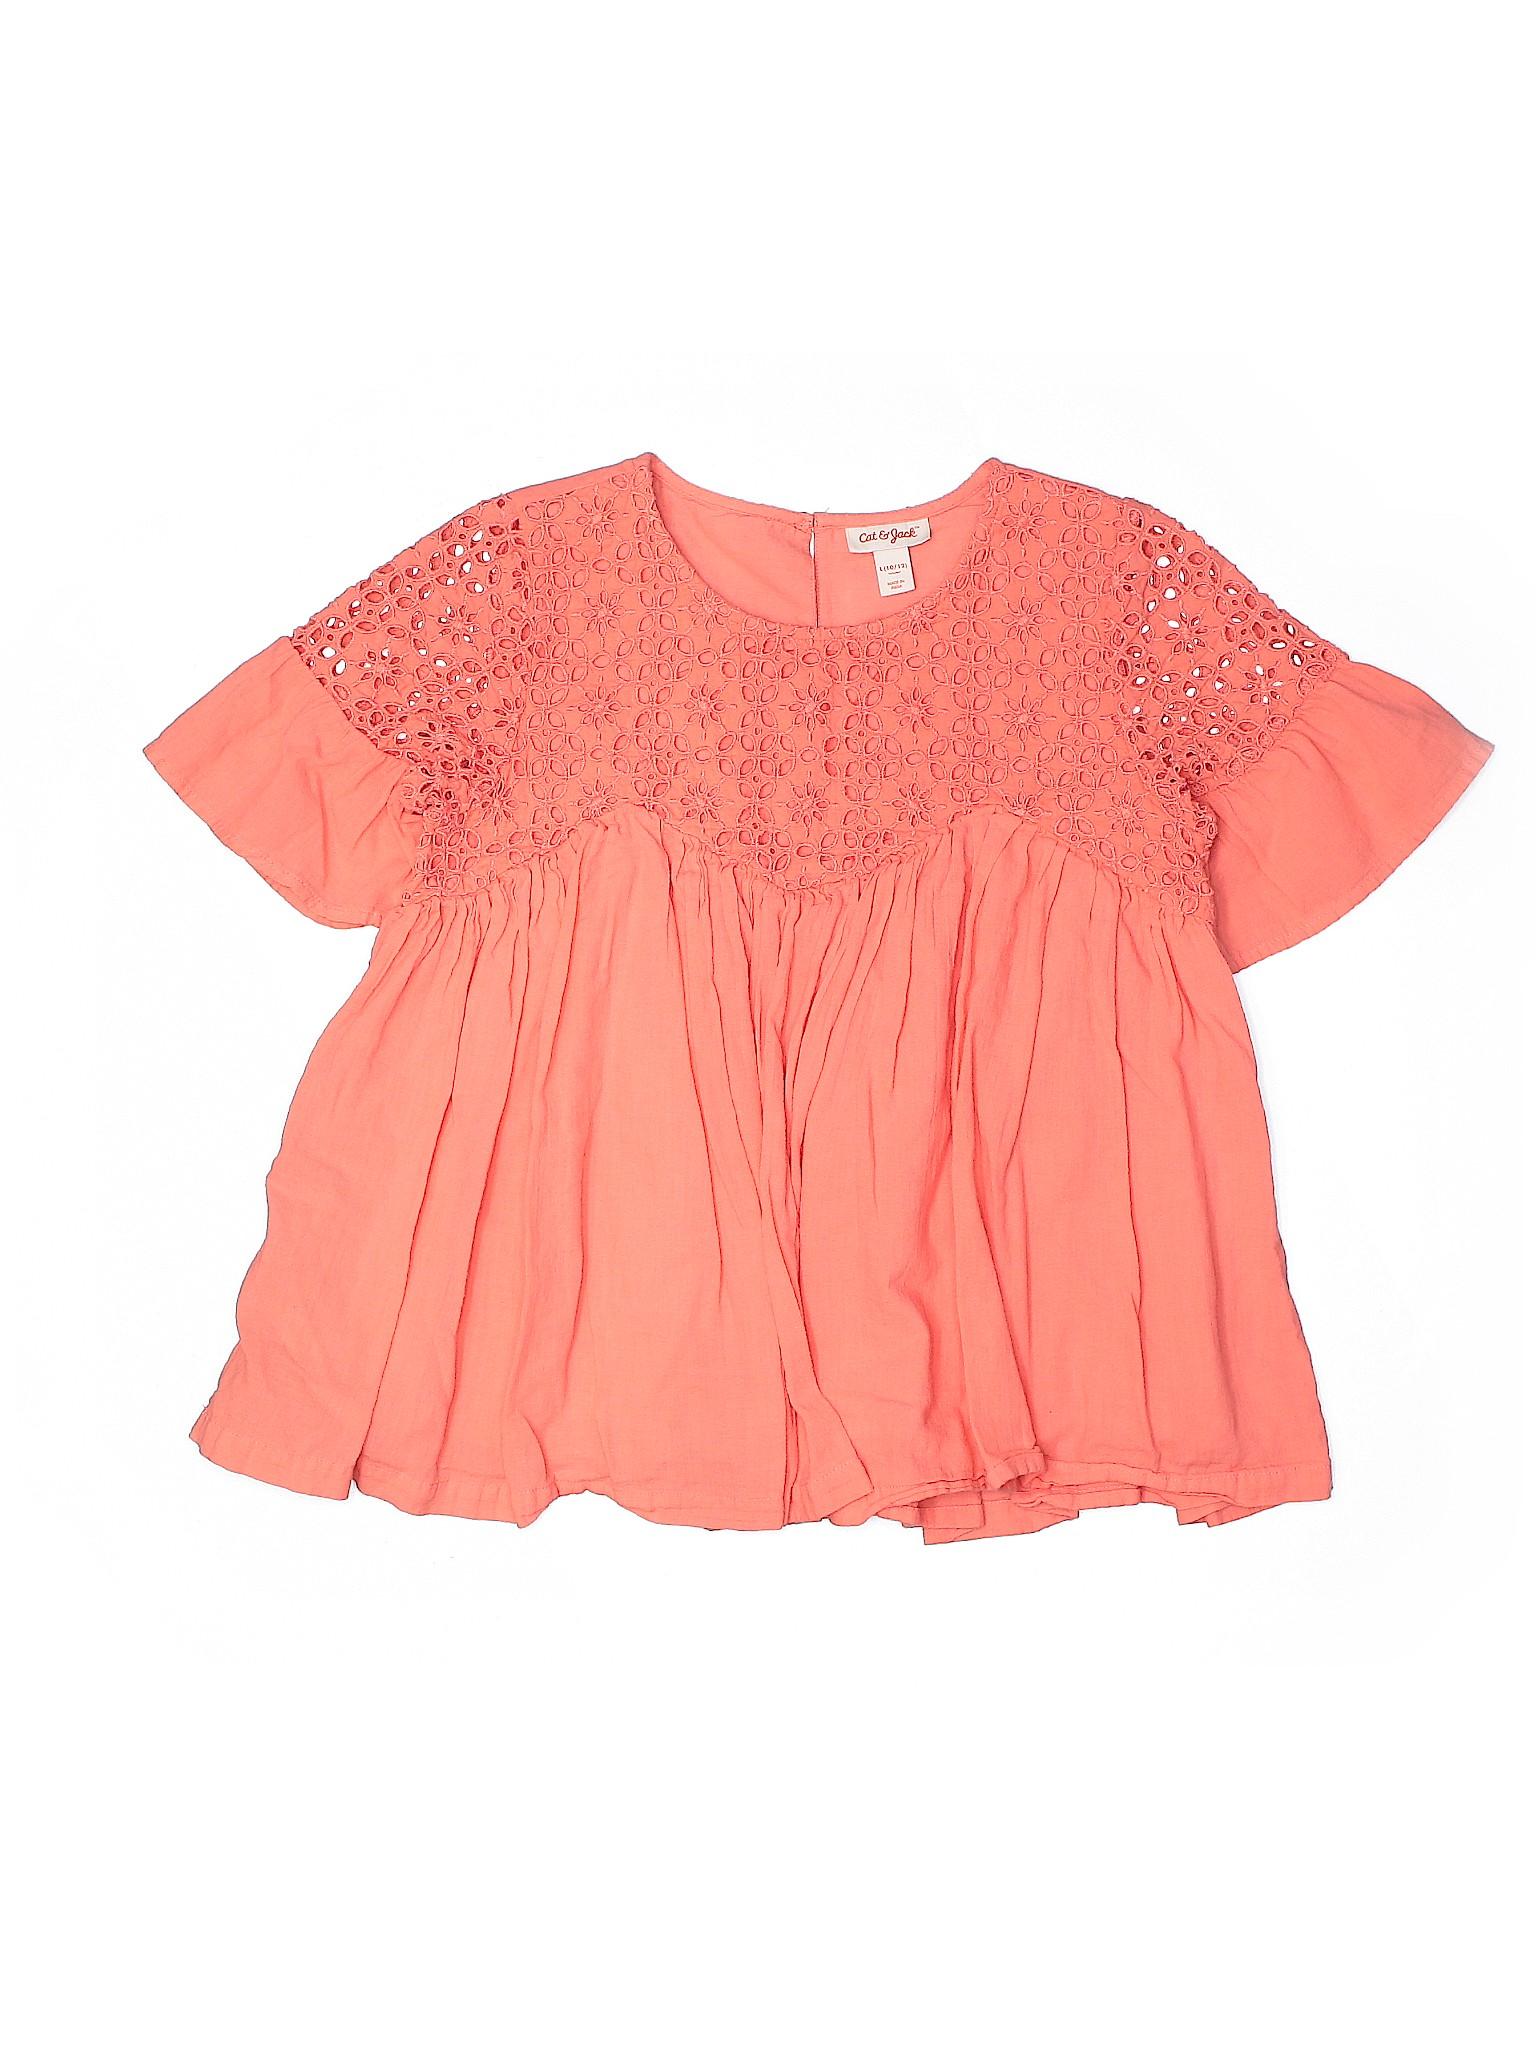 Girls Cat /& Jack Ruffle Short Sleeve Shirt Pink//Violet 4-5,10-12 3635 14-16